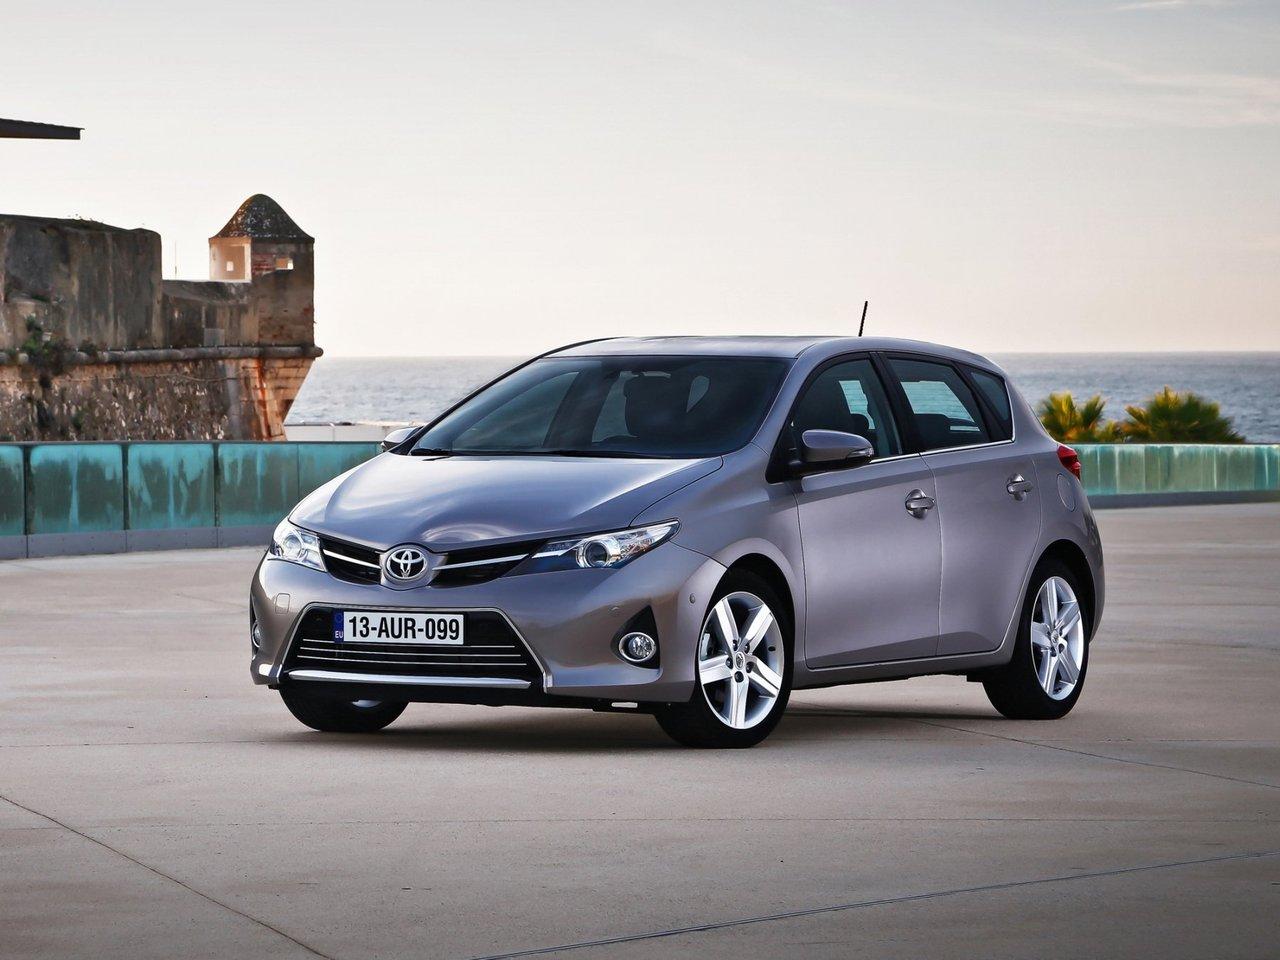 Снимки: Toyota Auris 2